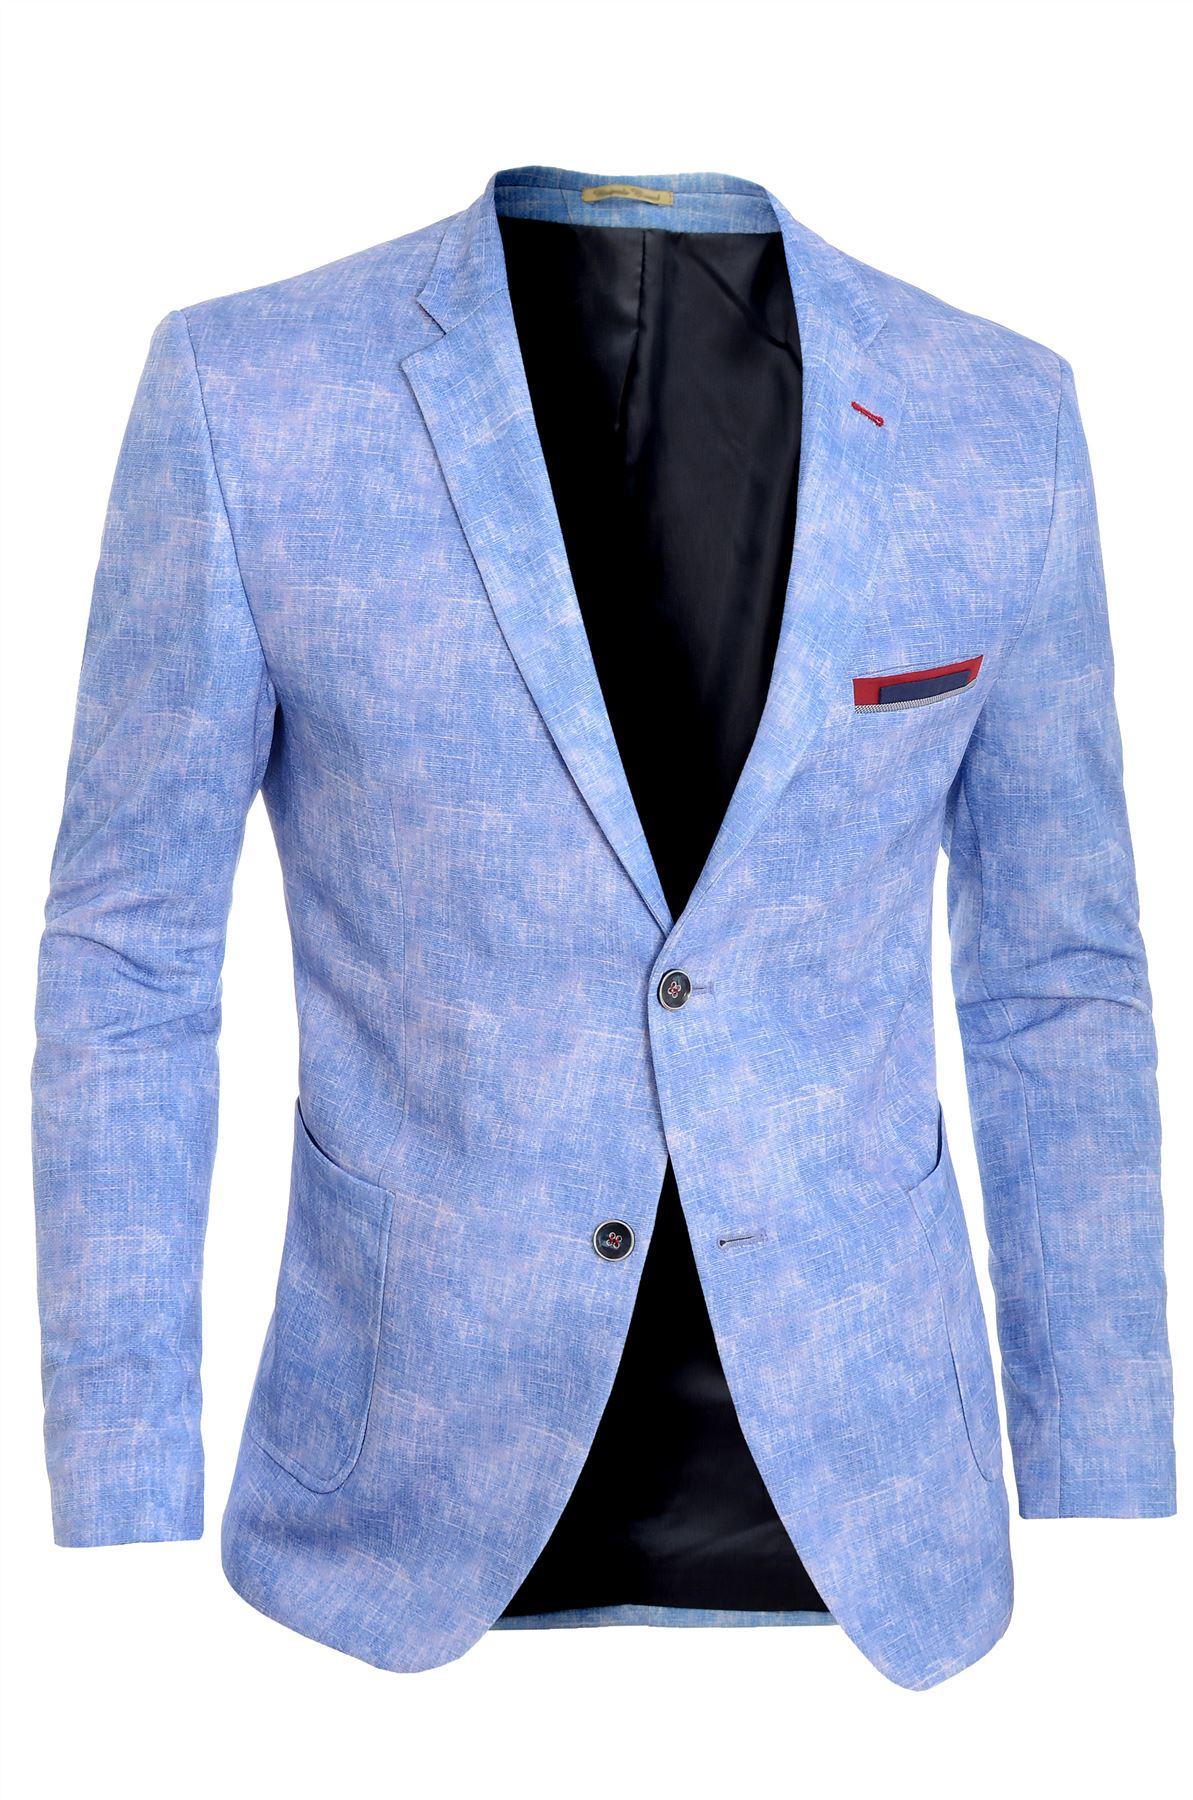 Men-039-s-Light-Blue-Blazer-Jacket-Casual-Smart-Slim-Fit-Summer-Red-Finish-Cotton thumbnail 4